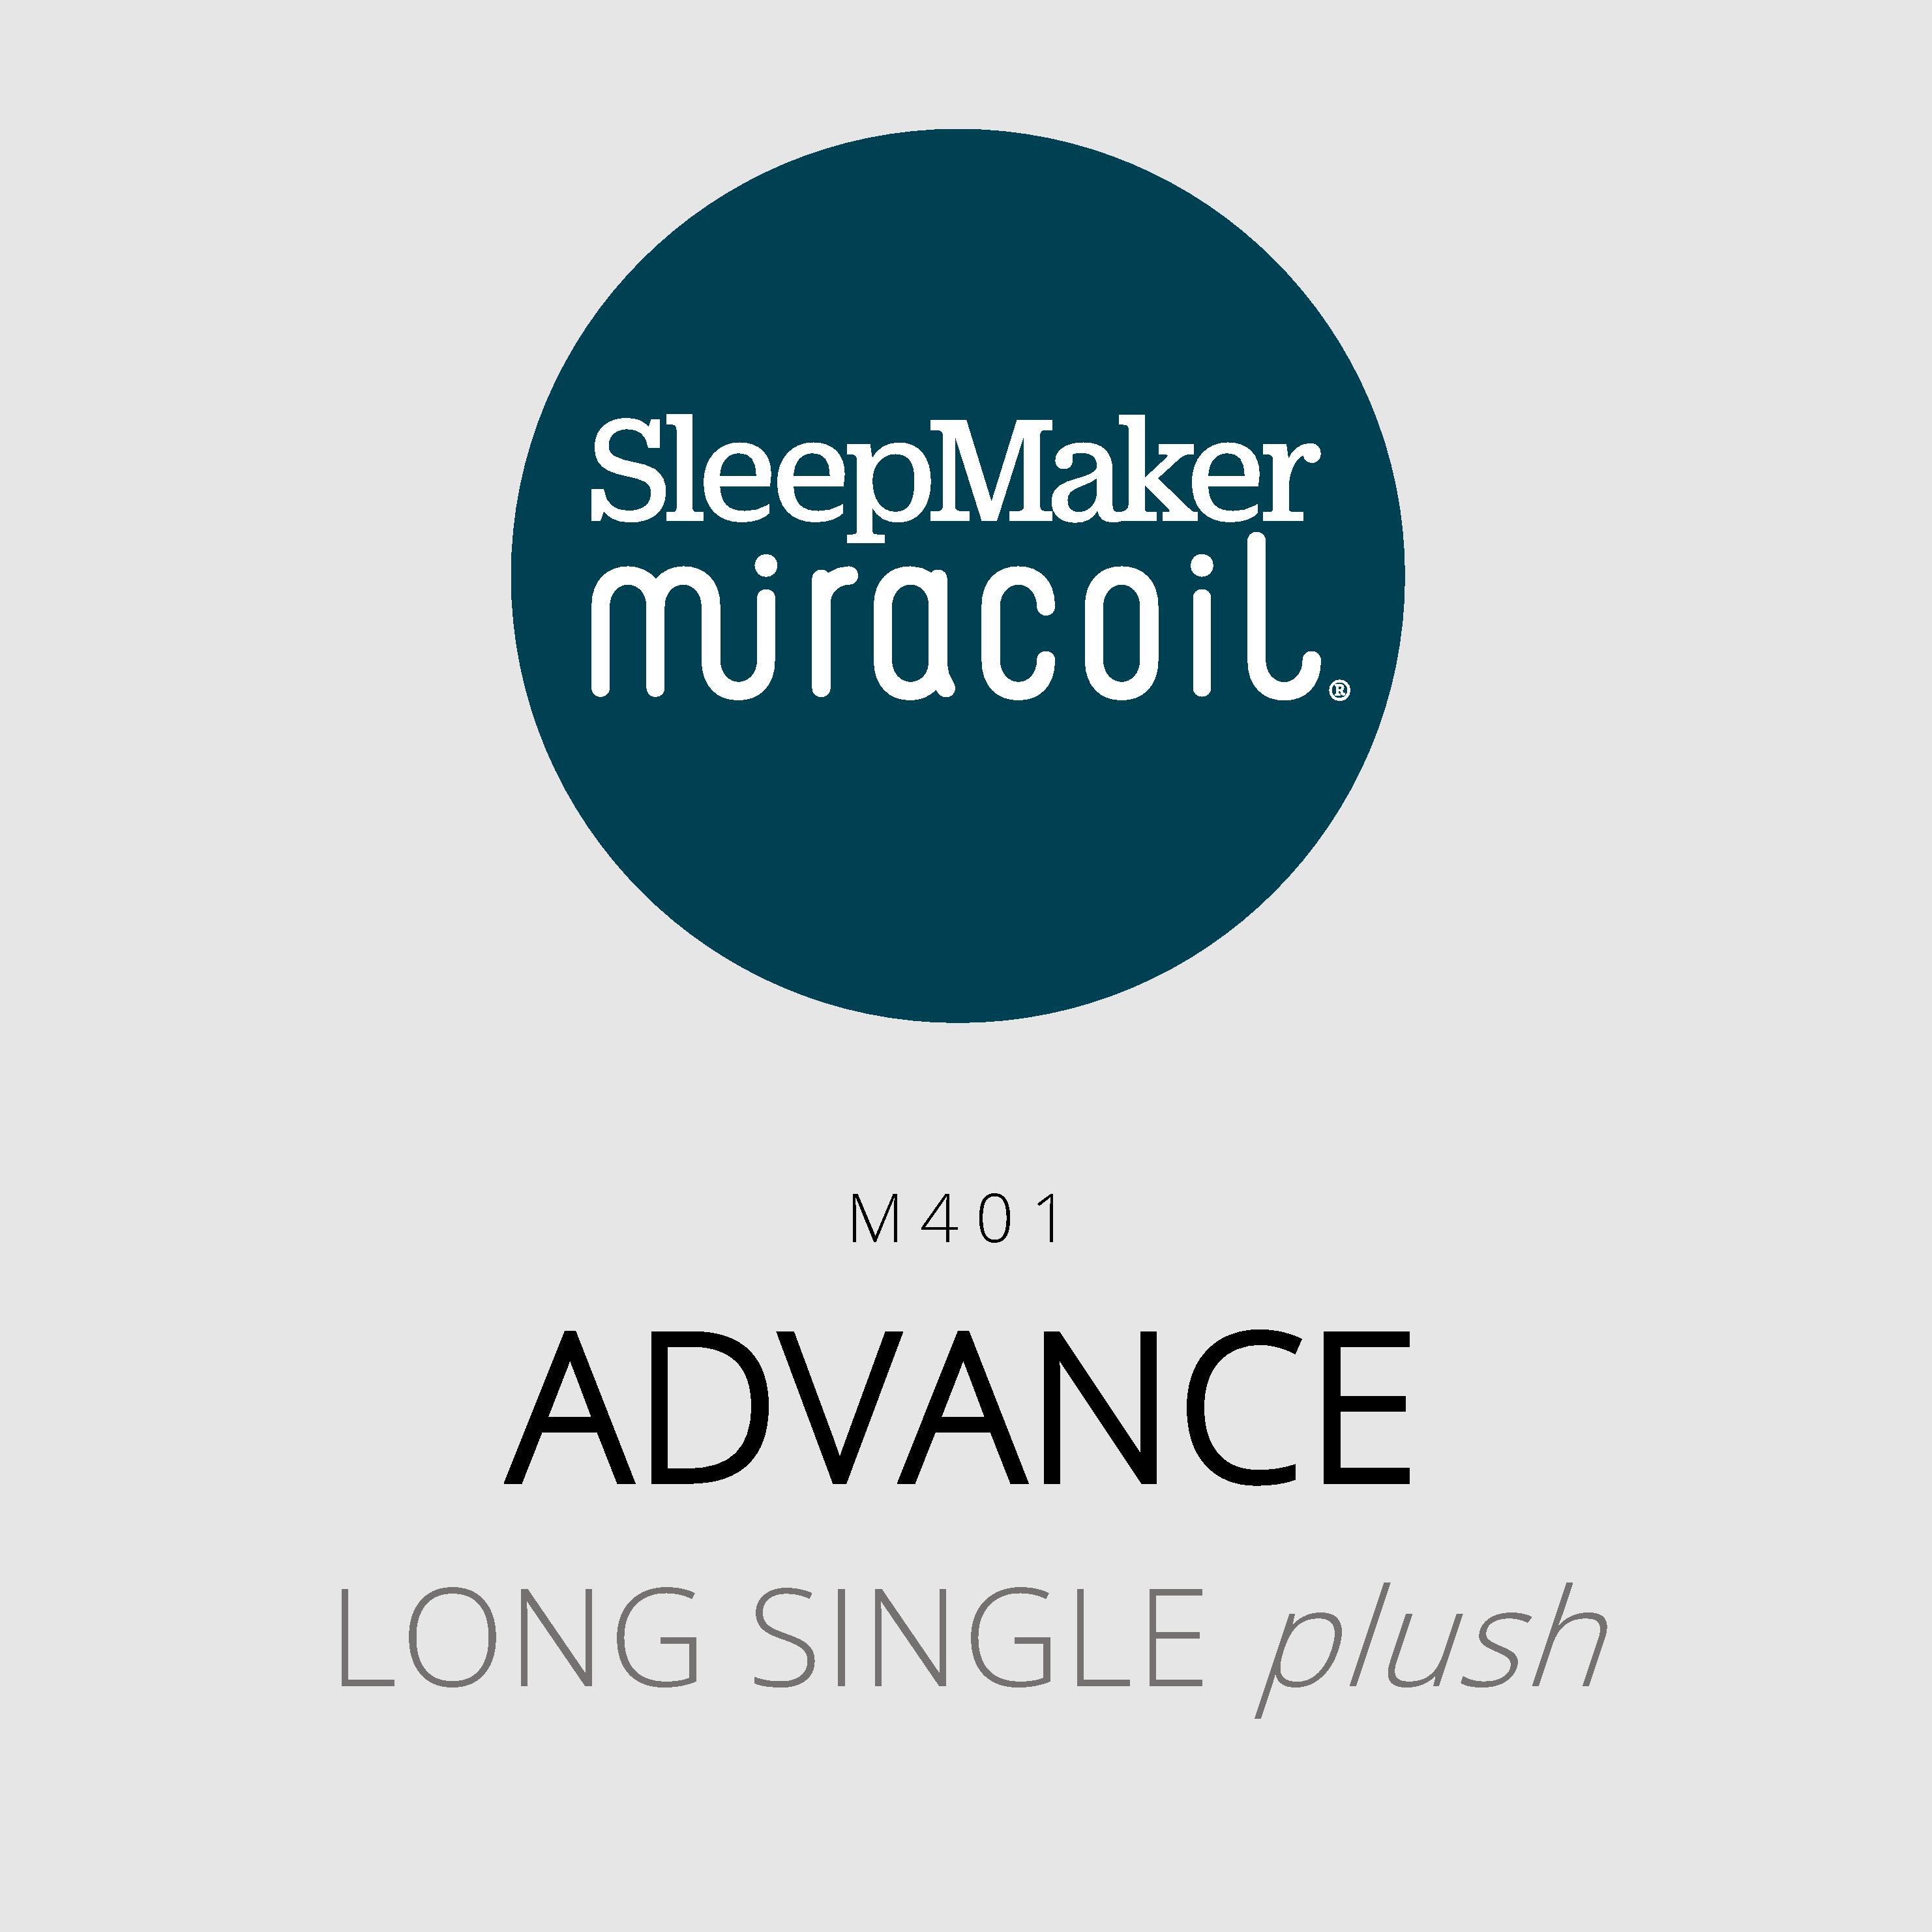 SleepMaker Miracoil – Advance – M401 – Long Single Plush Mattress